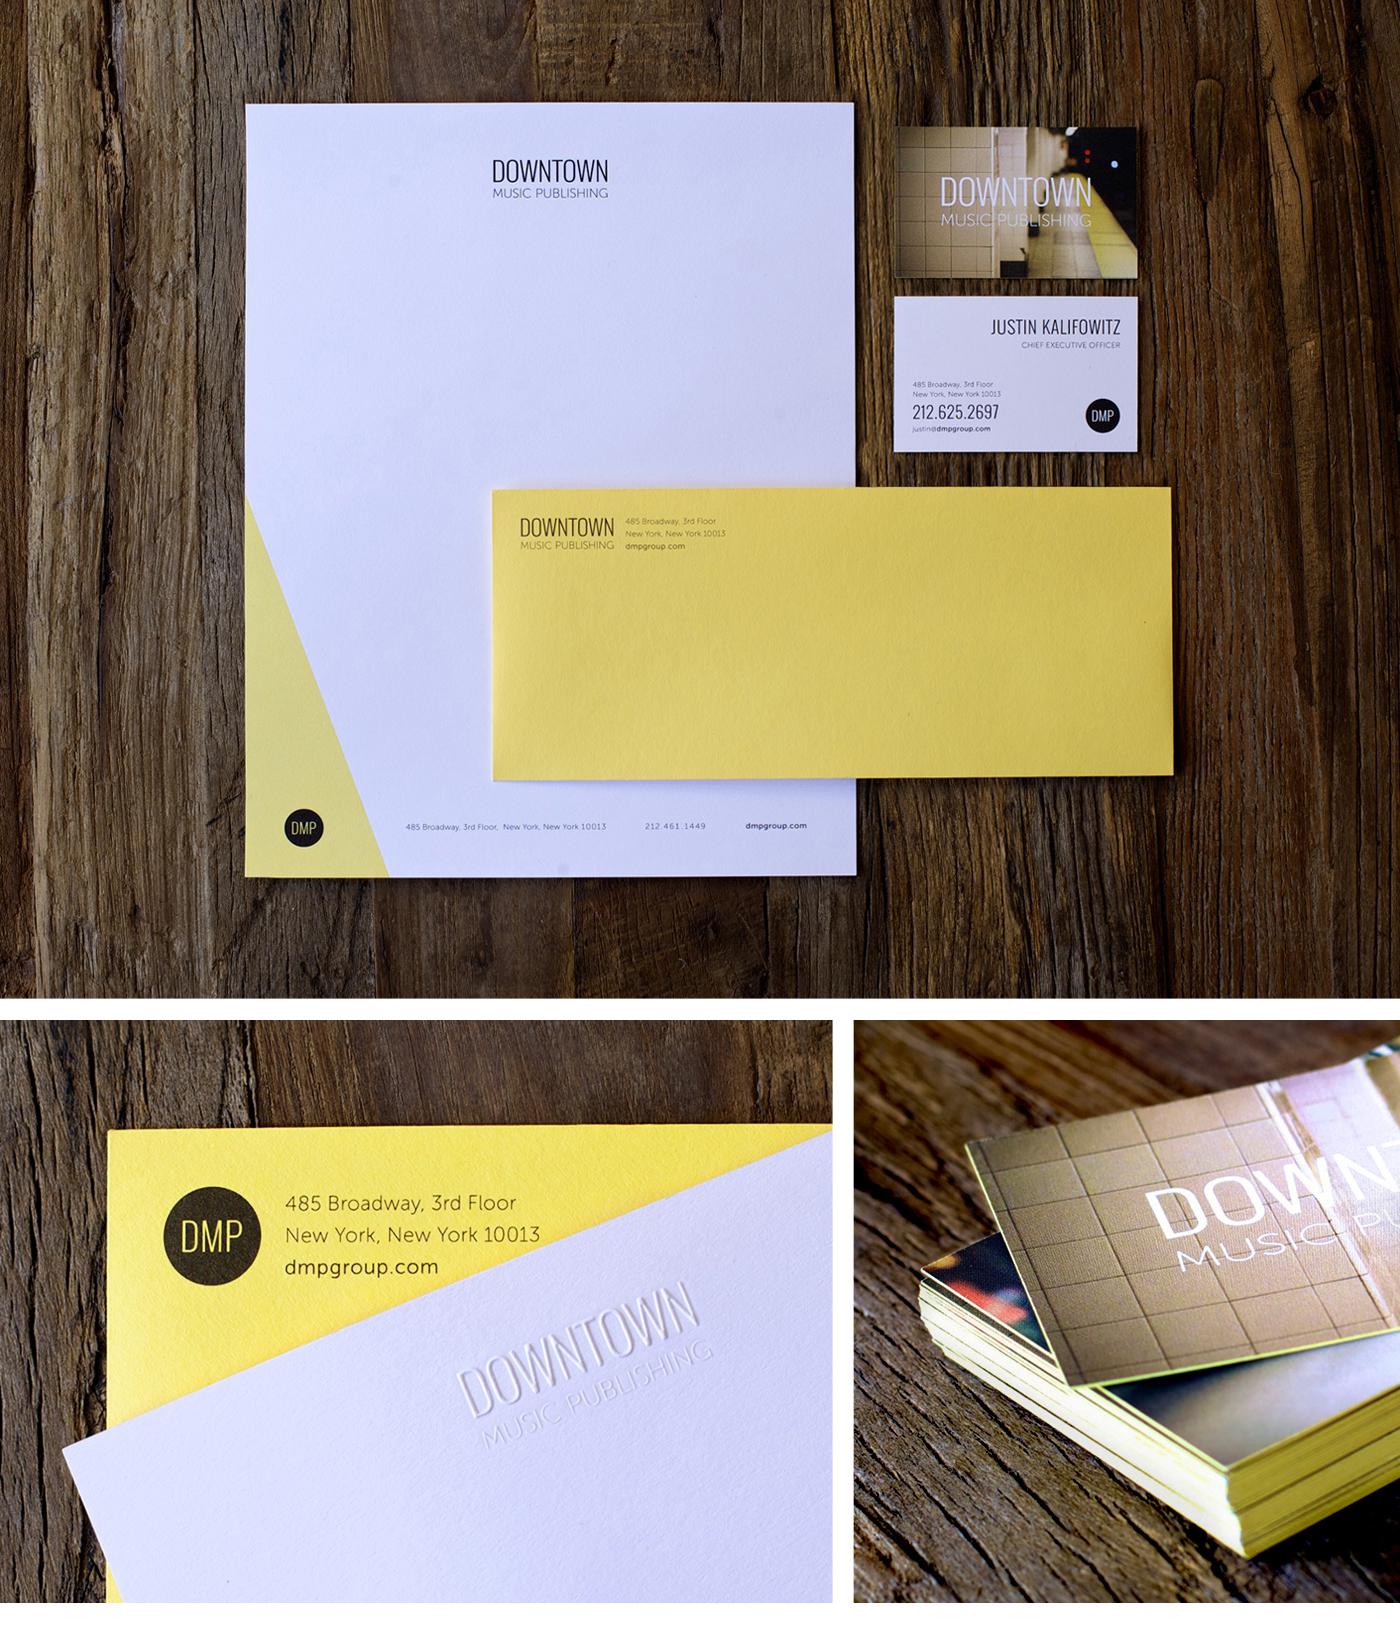 zmaic-downtown-music-publishing-dmp_branding-print-collateral-letterhead-envelope-business-card-blind-embossed-notecard.jpg